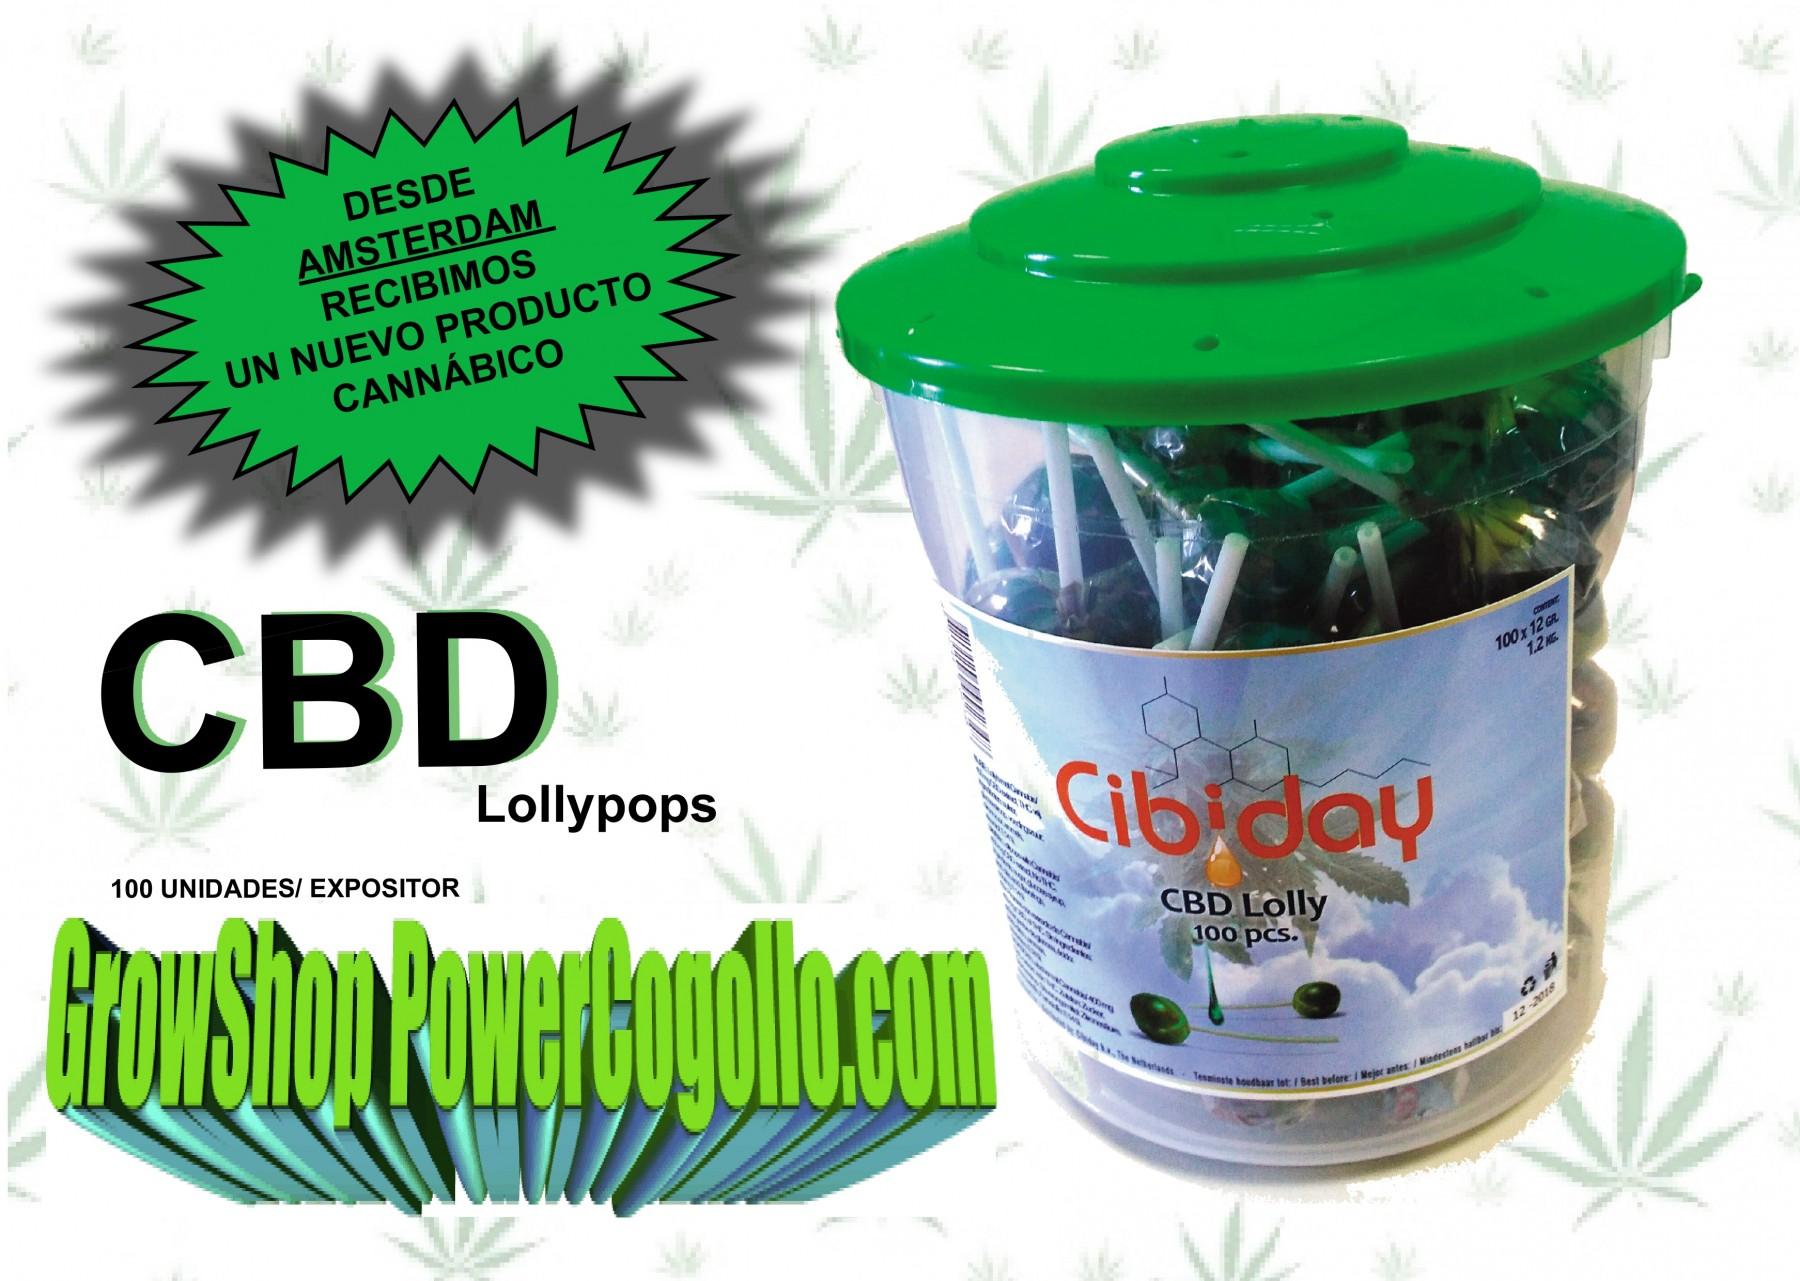 ChupaChups de Marihuana con CBD (Cannashock) 1